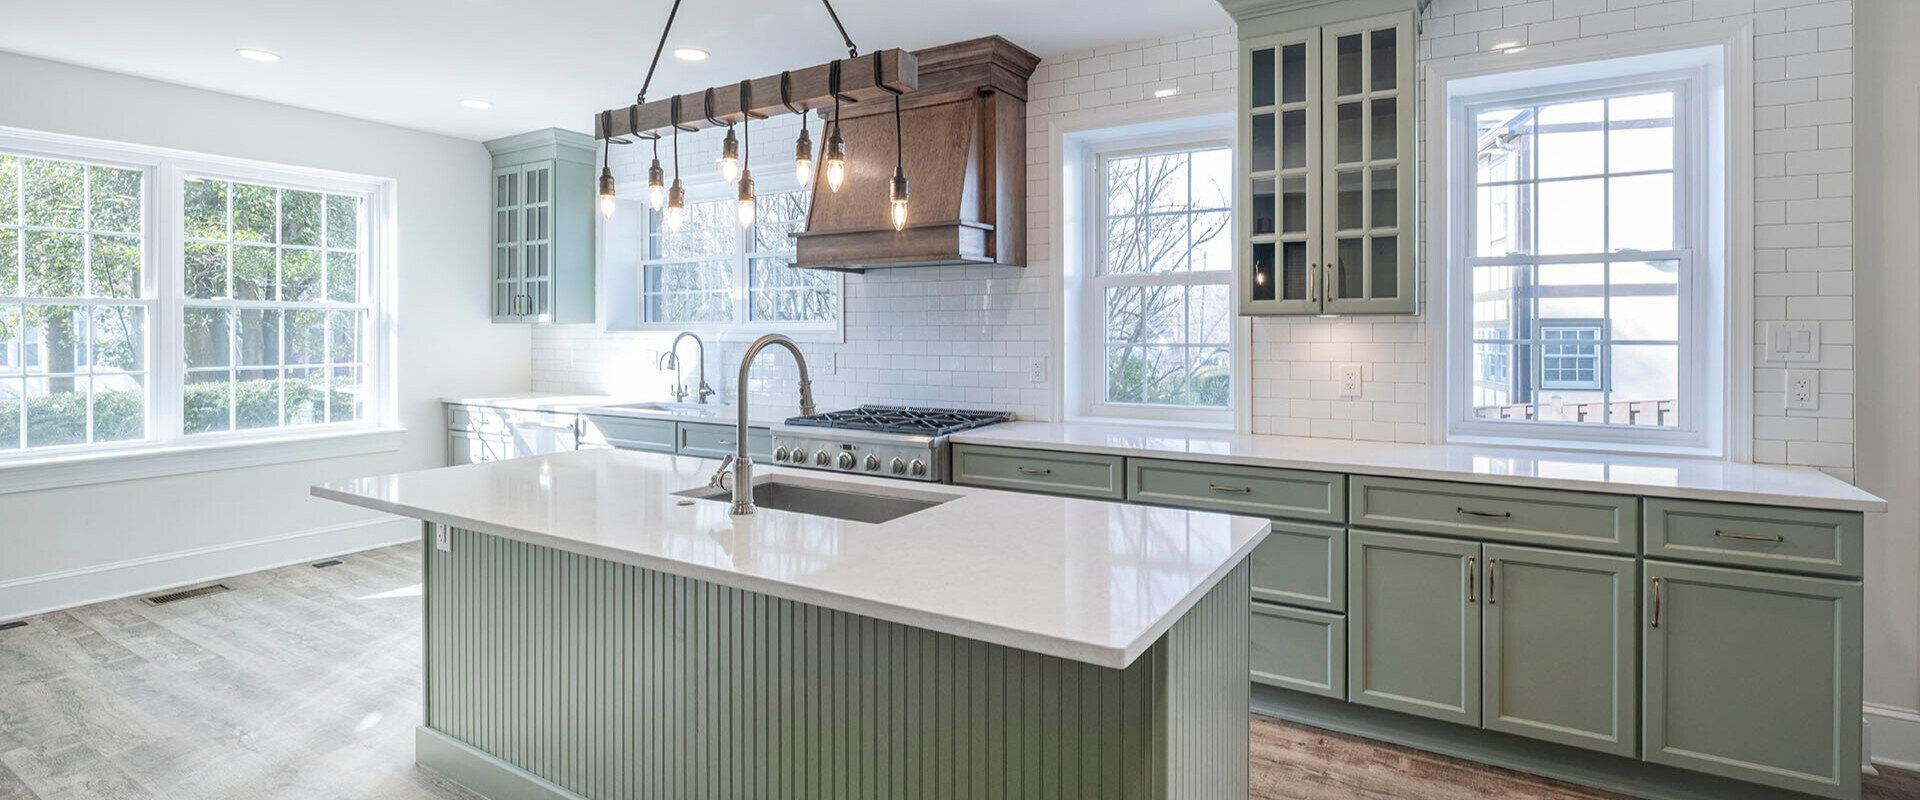 Kitchen Remodeling in Washington, D.C.